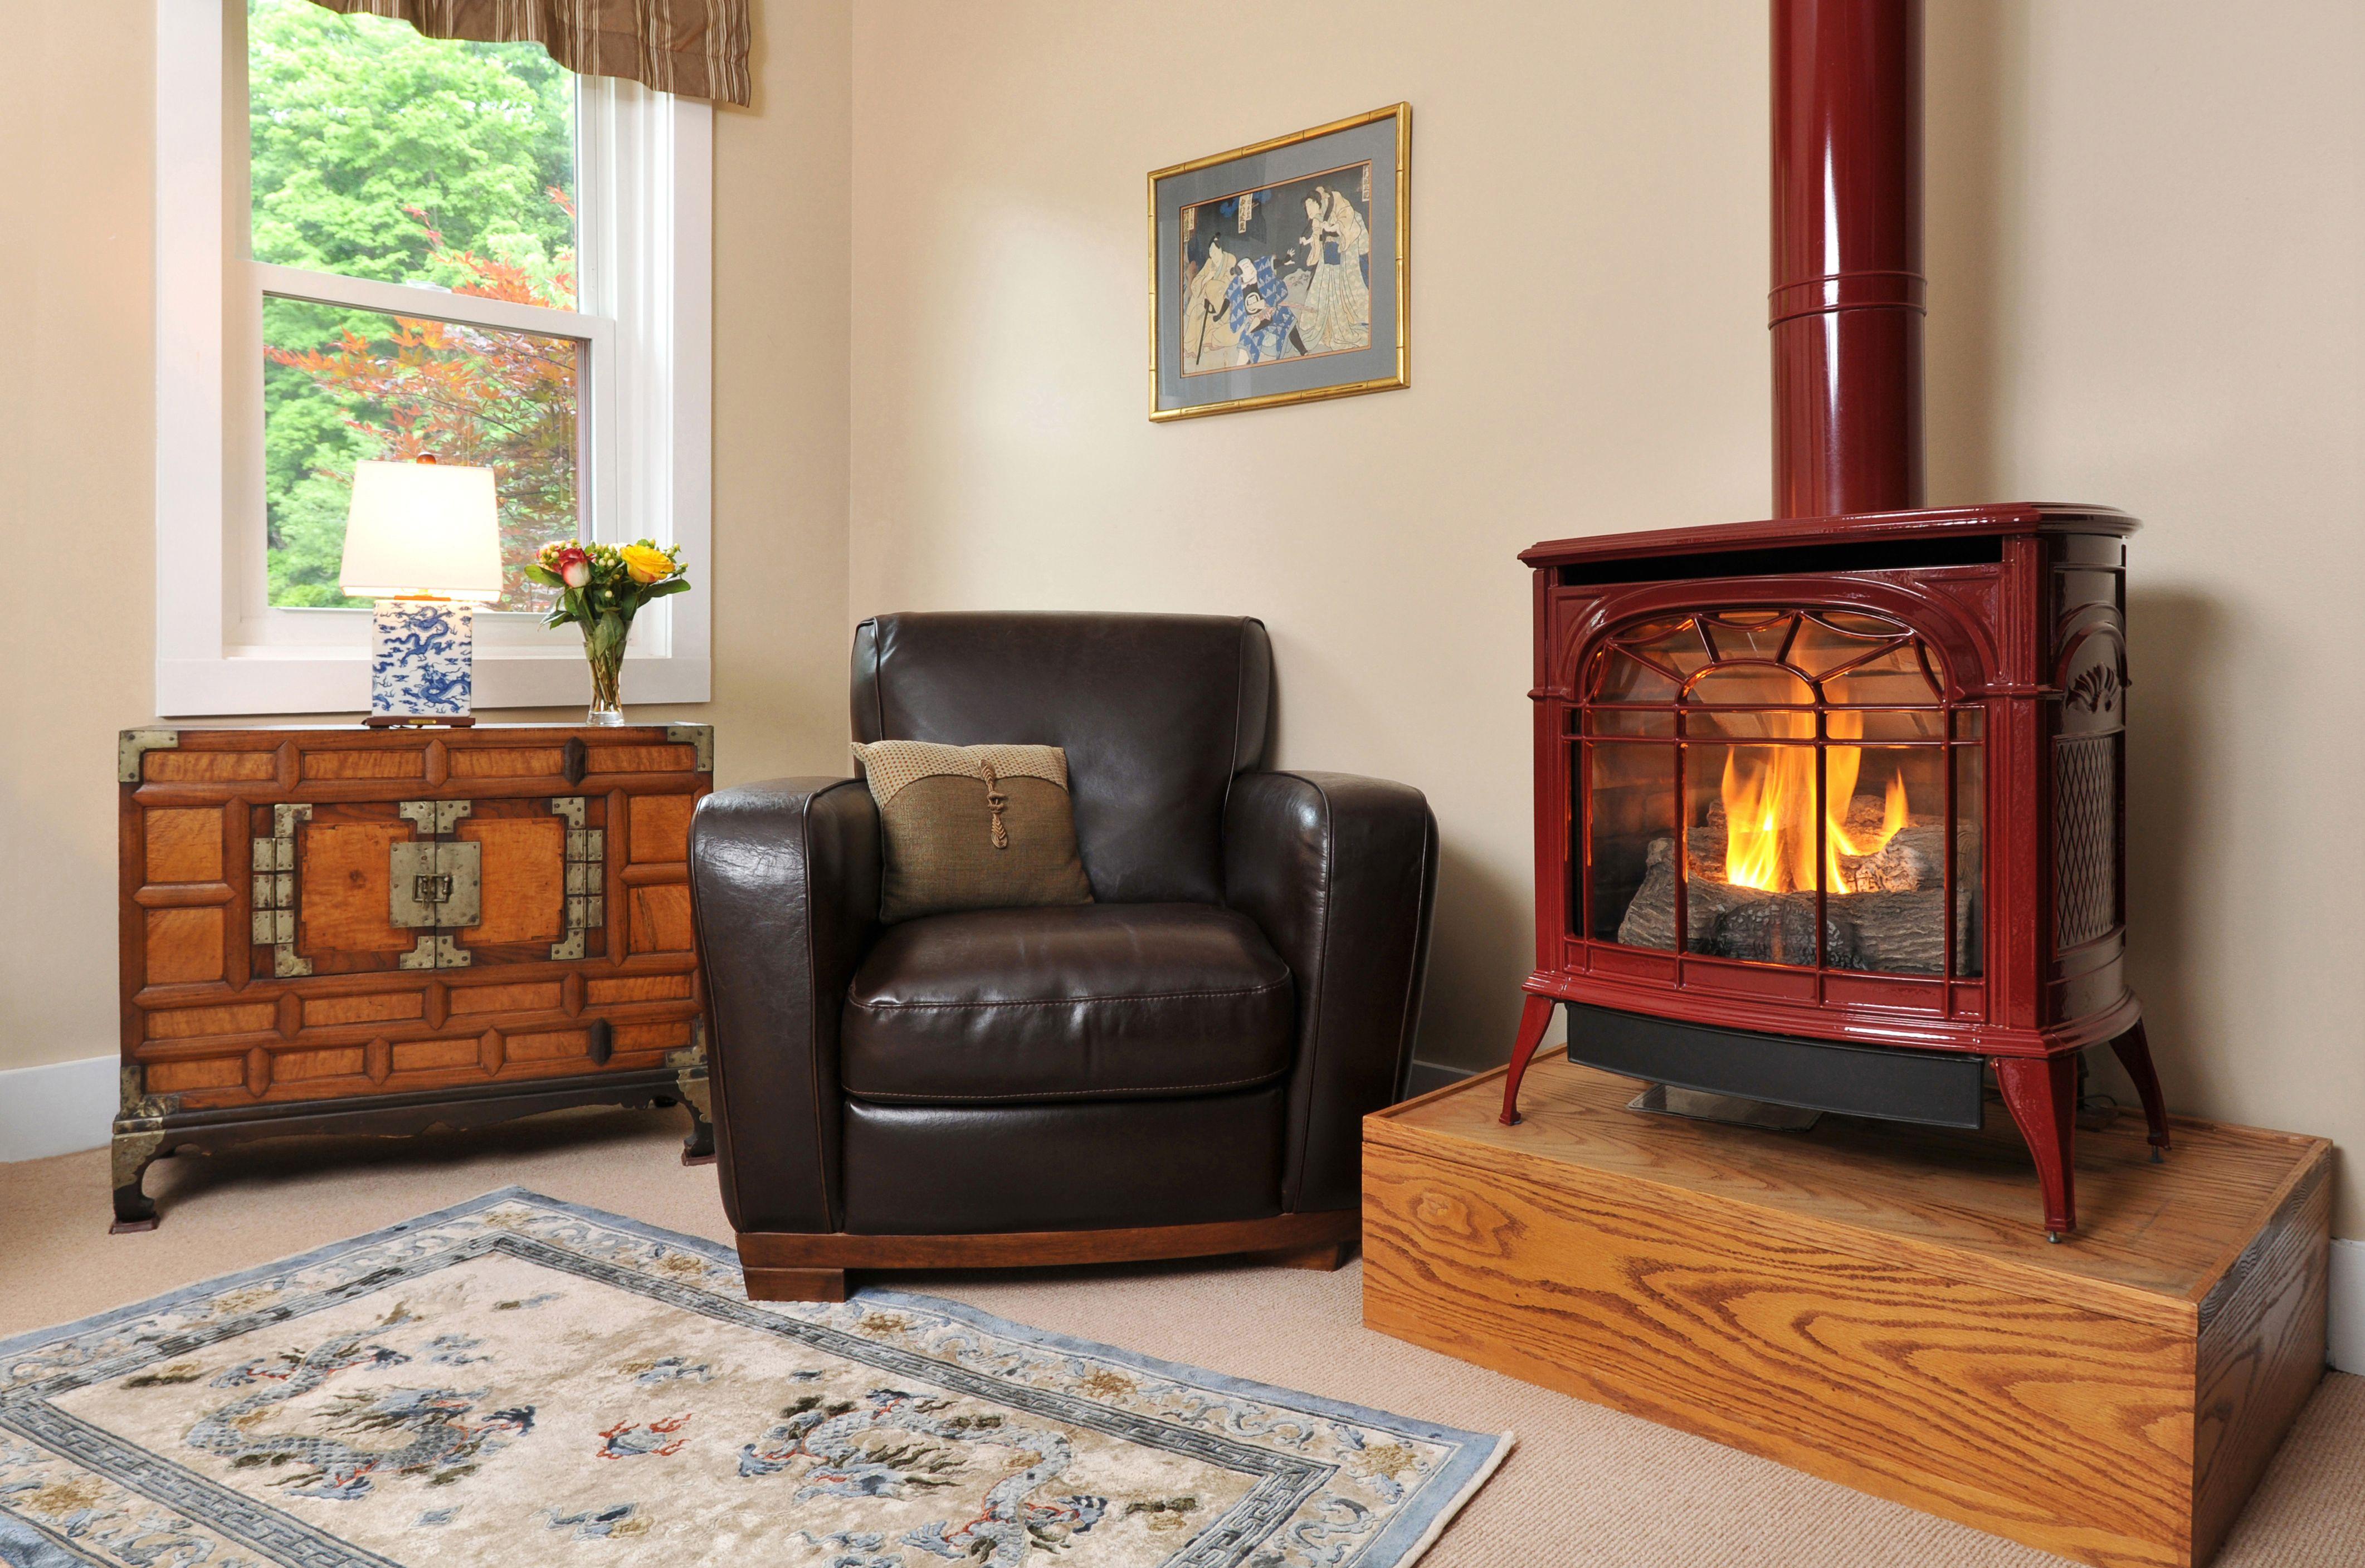 Finger Lakes Luxury Suites Home appliances, Home